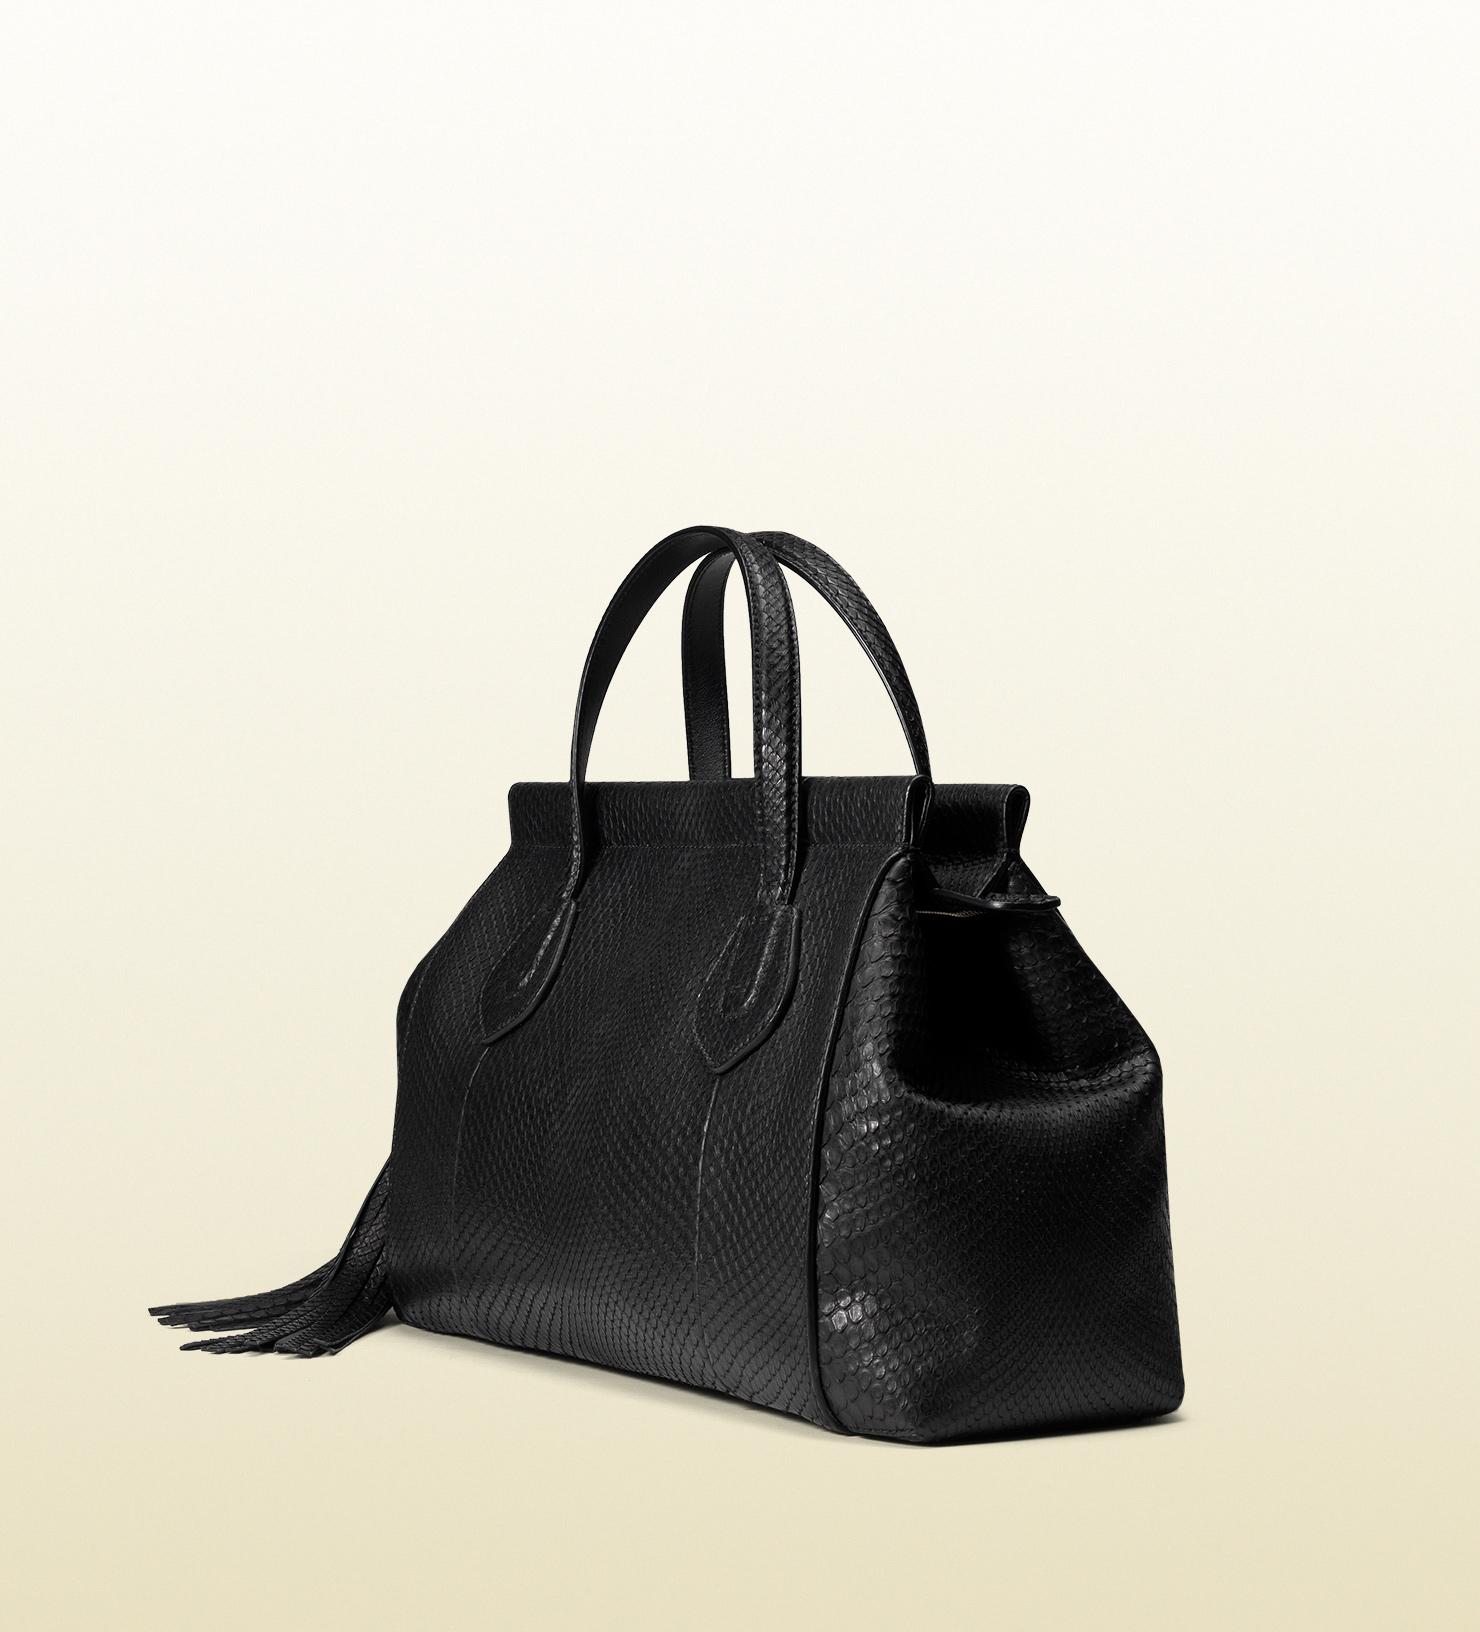 bf9c3f0feeea2 Gucci Black Python Leather Stirrup Top Handle Hobo Bag. Gucci Python Small  Soho Chain Shoulder ...